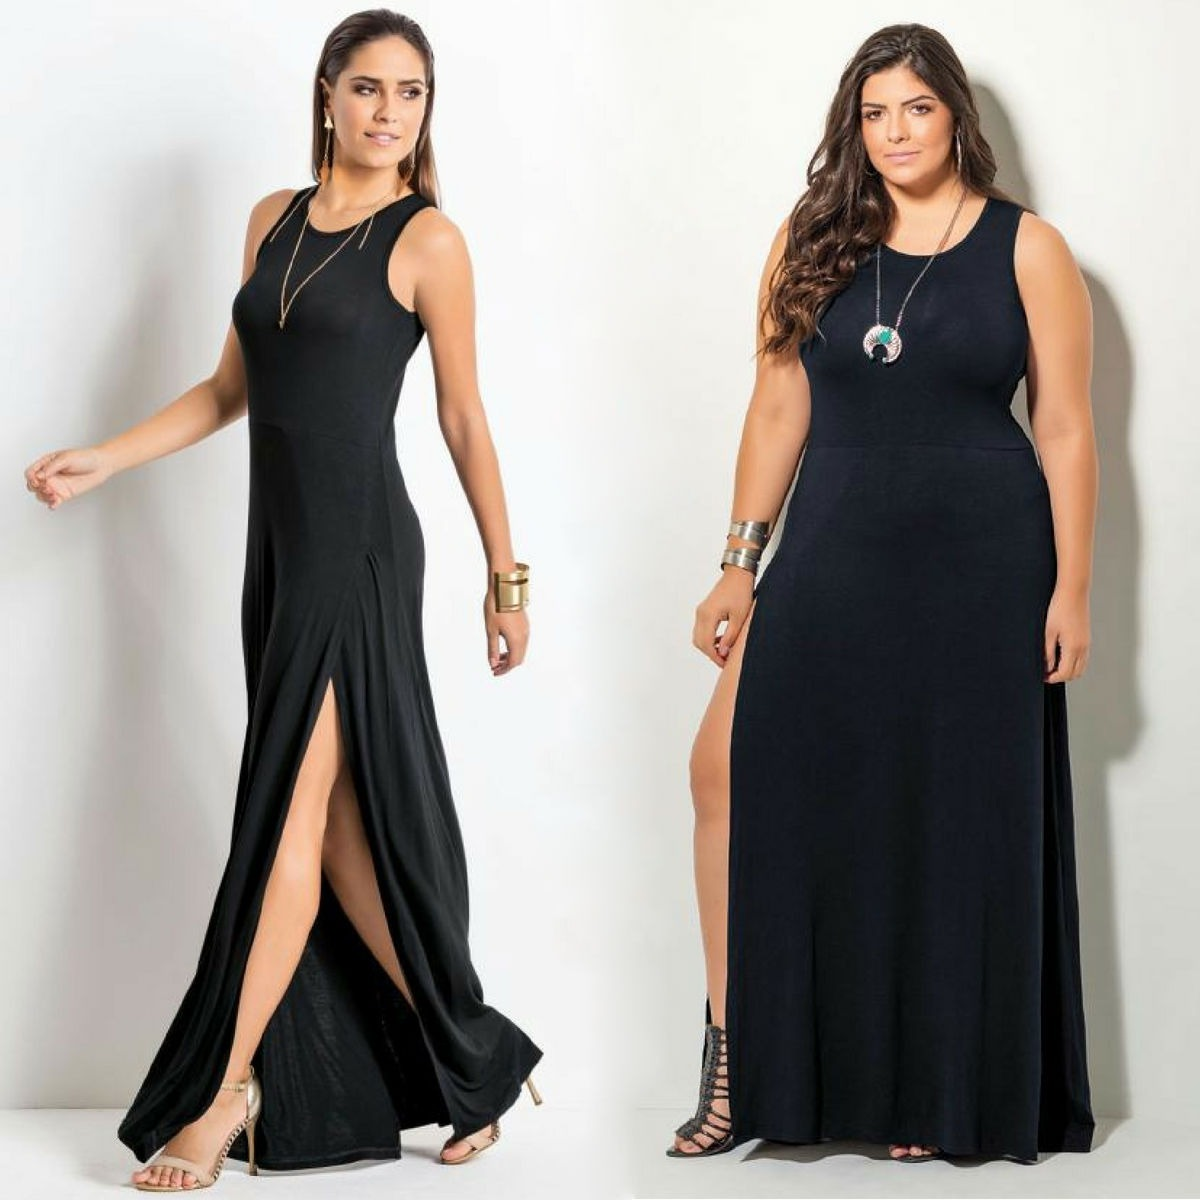 a557725365 vestido feminino longo moda plus size preto gordinha barato. Carregando  zoom.